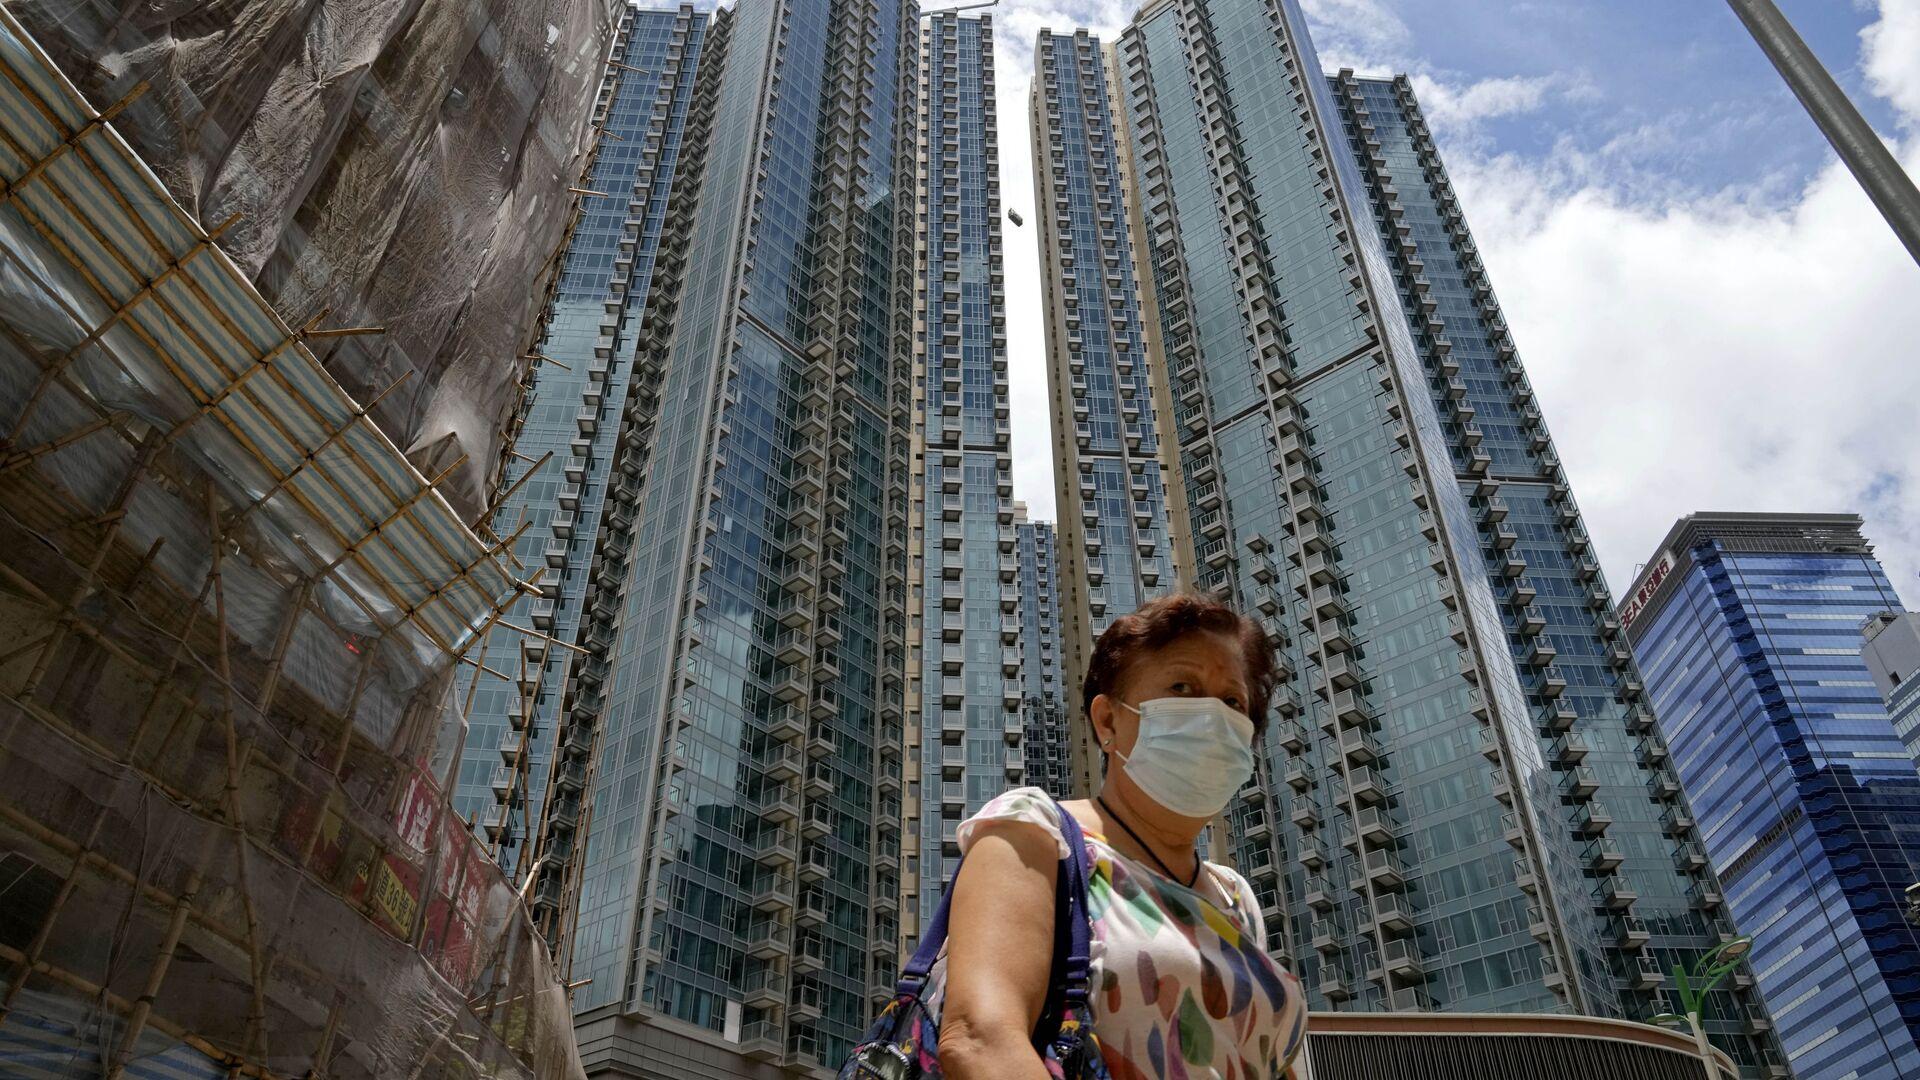 Zona residencial en Hong Kong - Sputnik Mundo, 1920, 01.07.2021